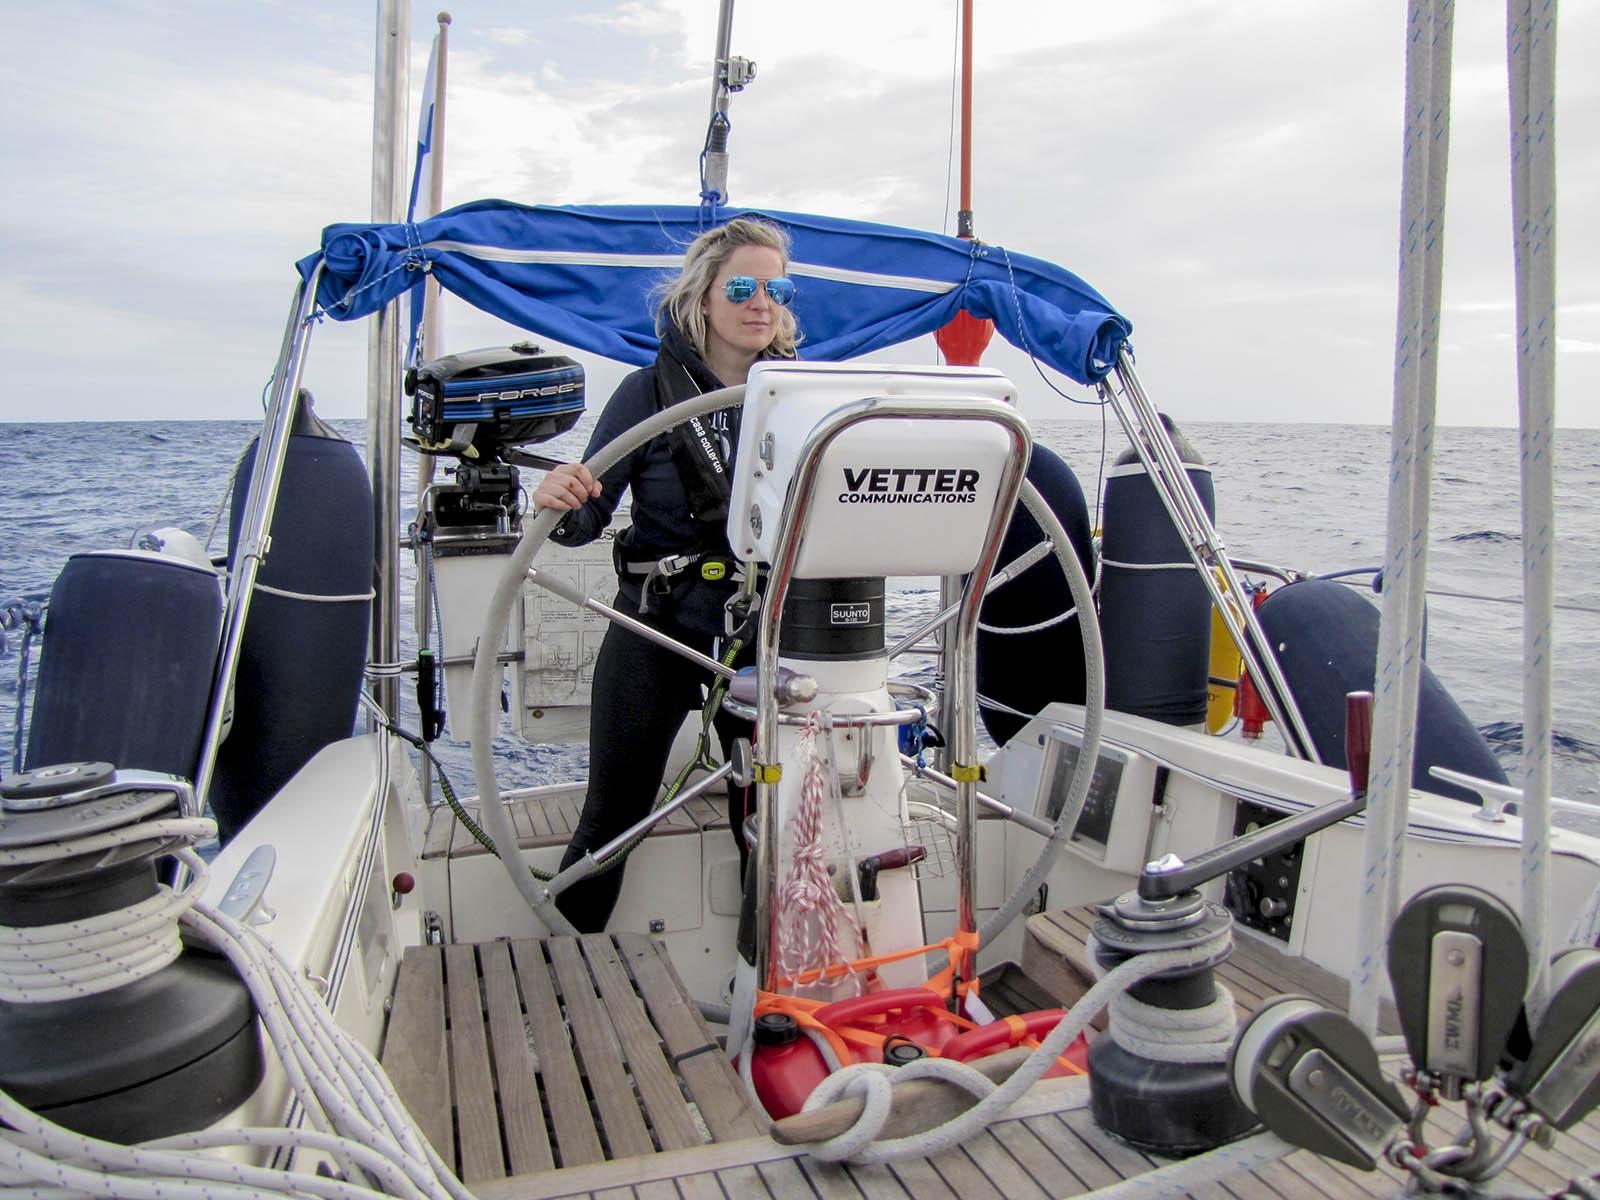 carissa ocean ladies lissabon madeira arc2018 (7)